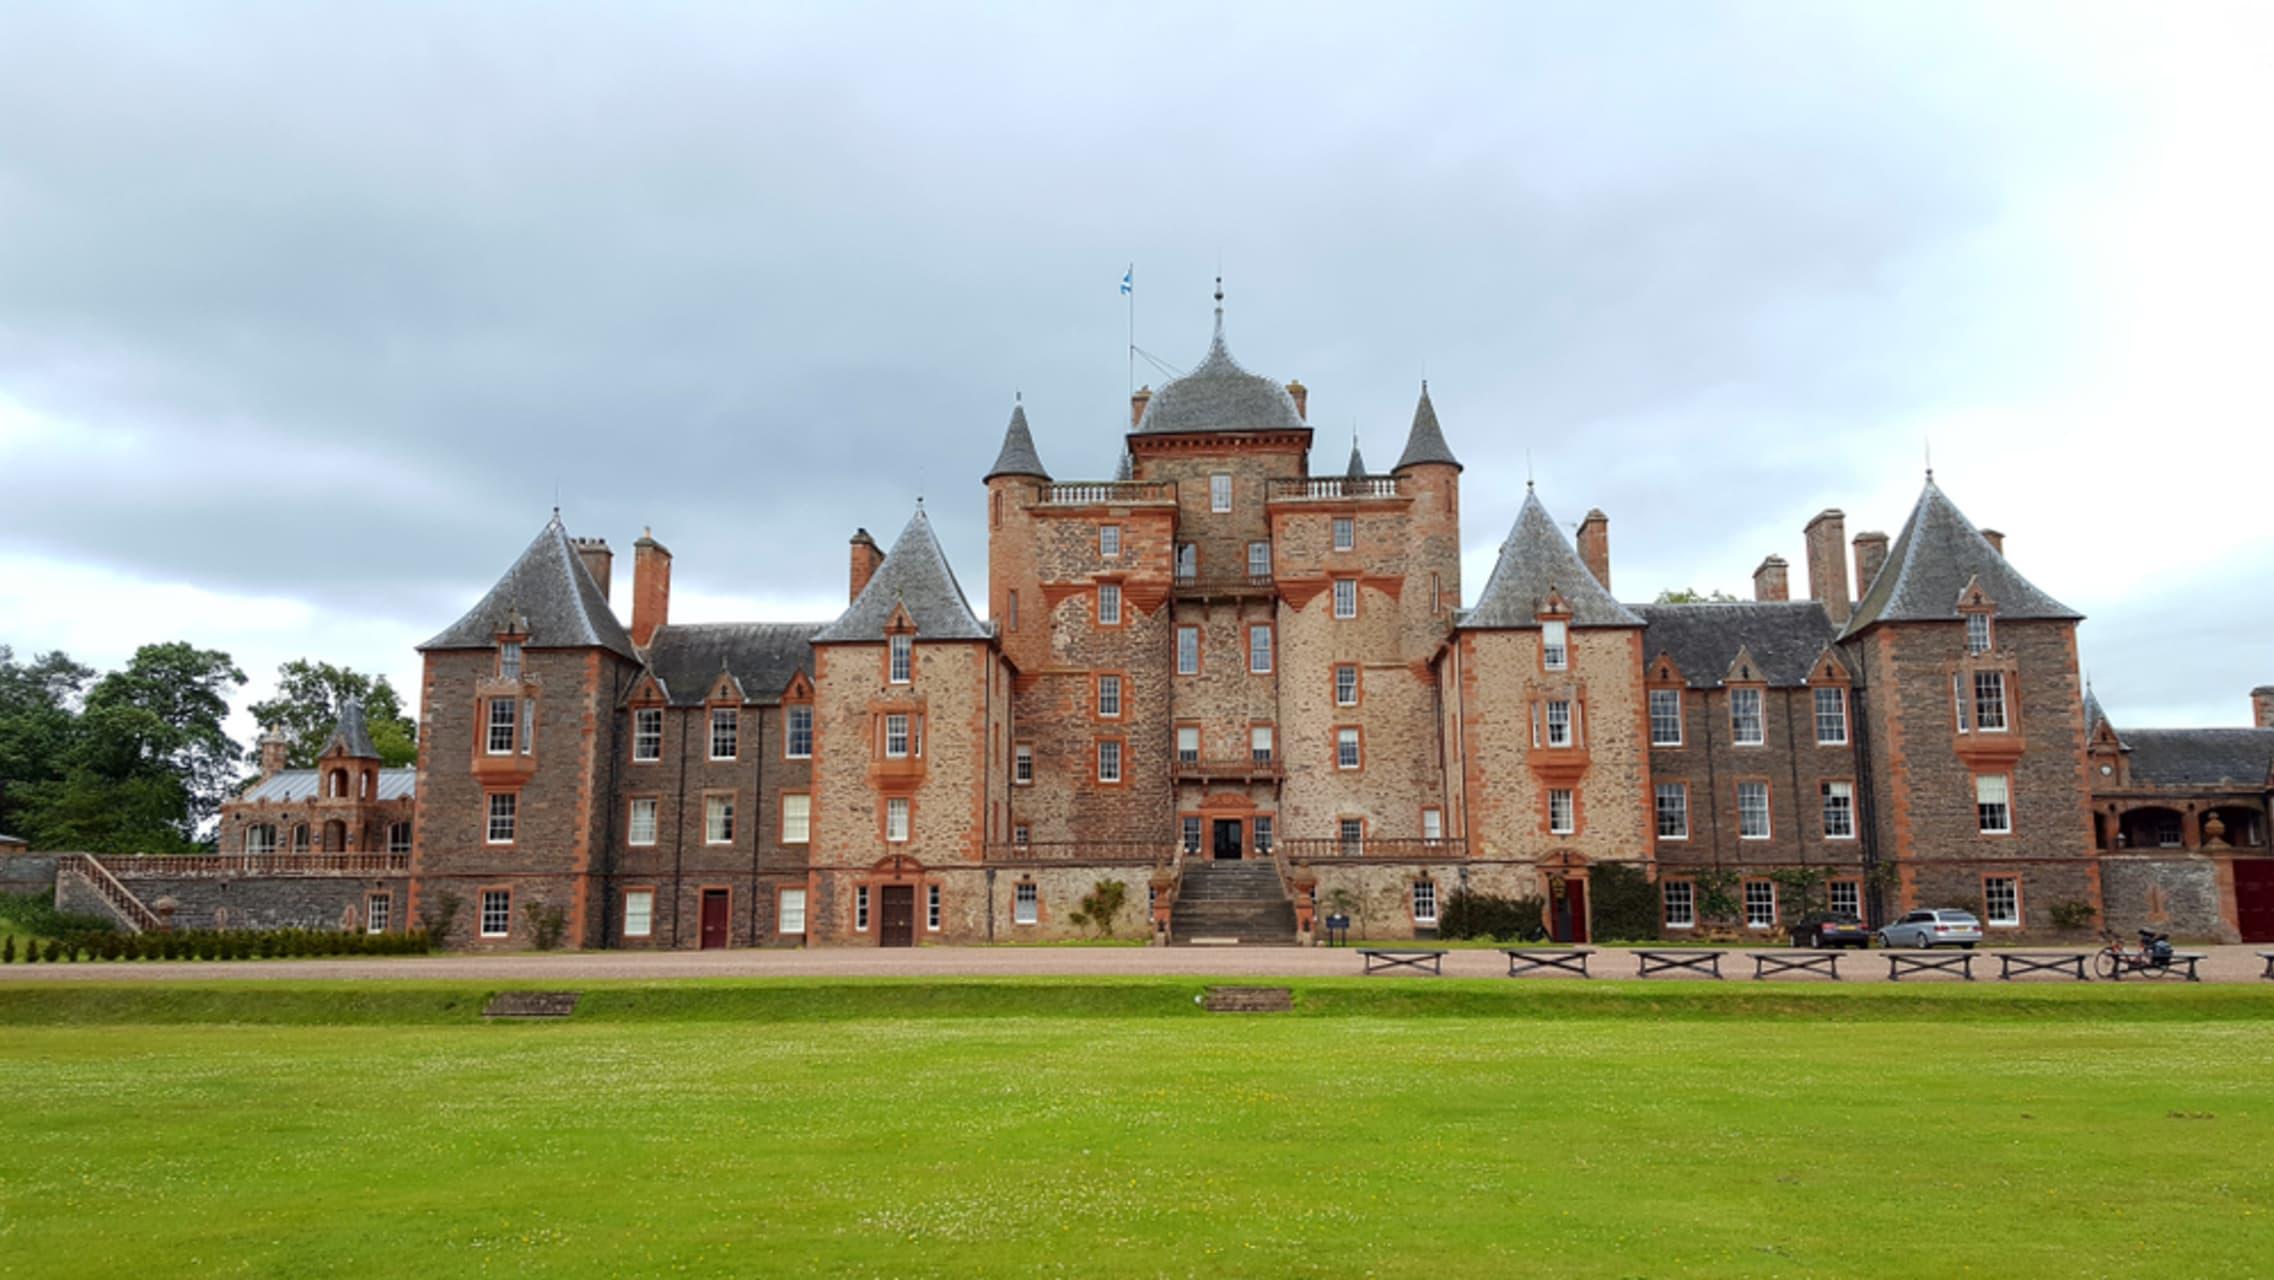 Central Scotland - Thirlestane Castle: One of Scotland's Oldest Inhabited Castles